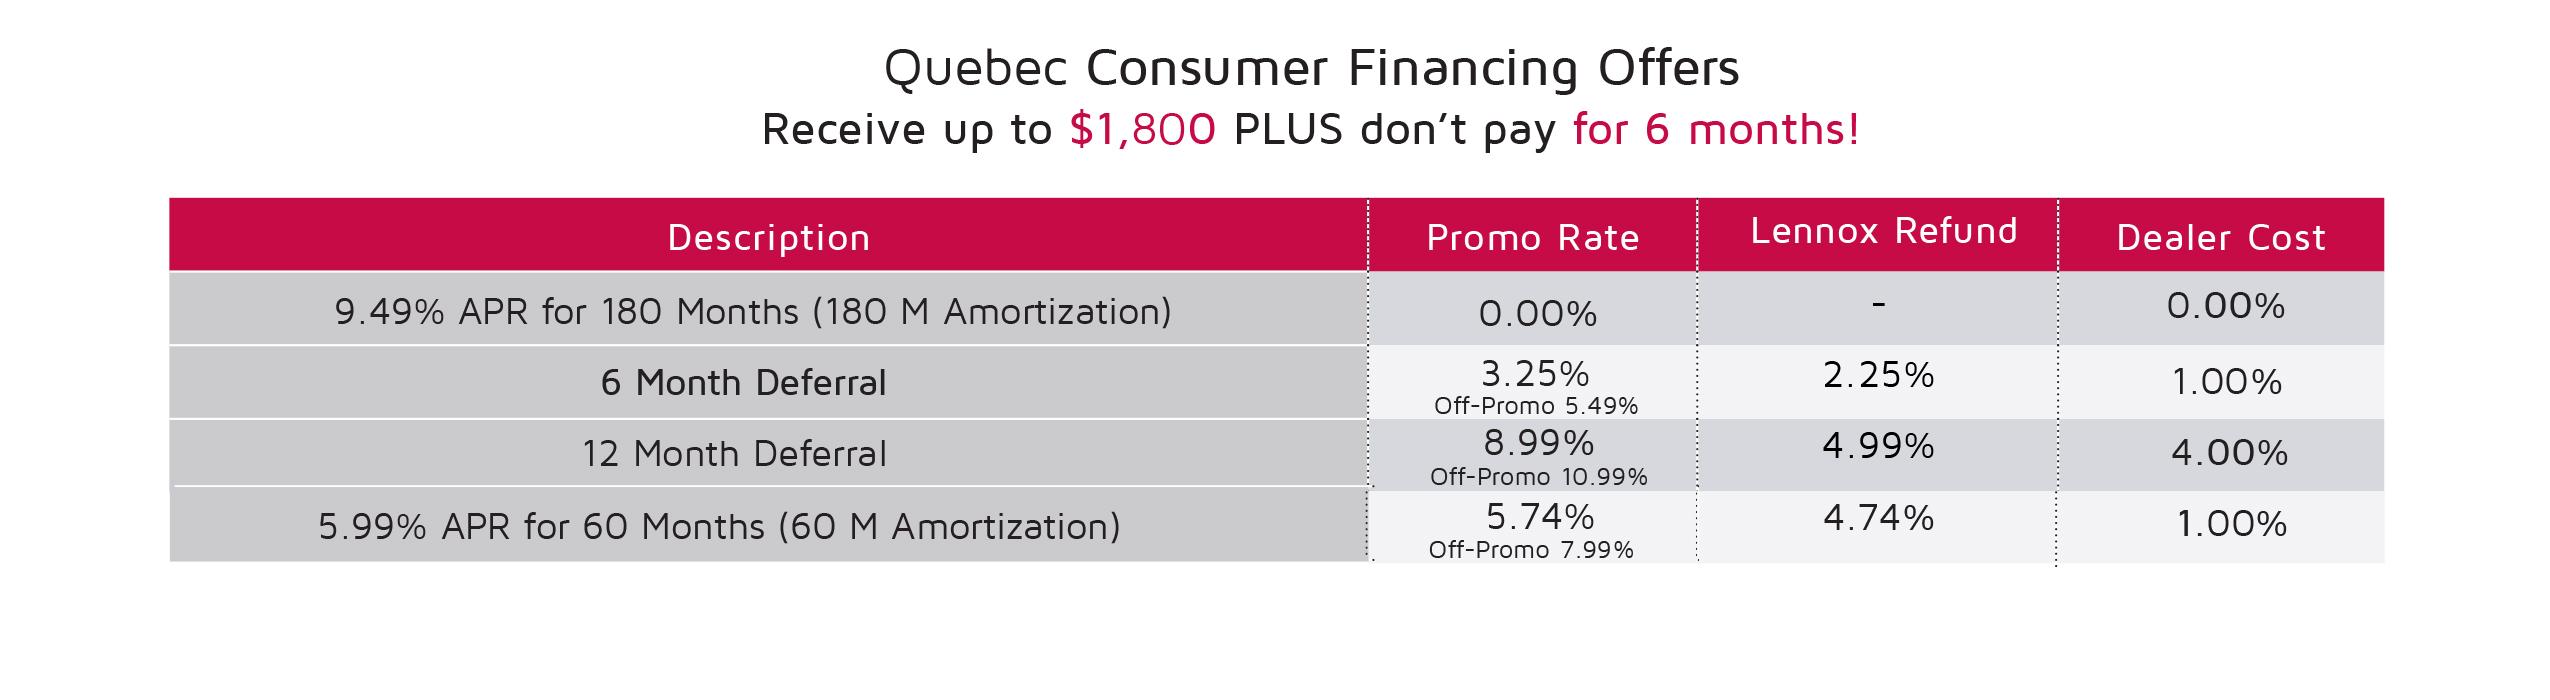 Quebec Consumer Financing